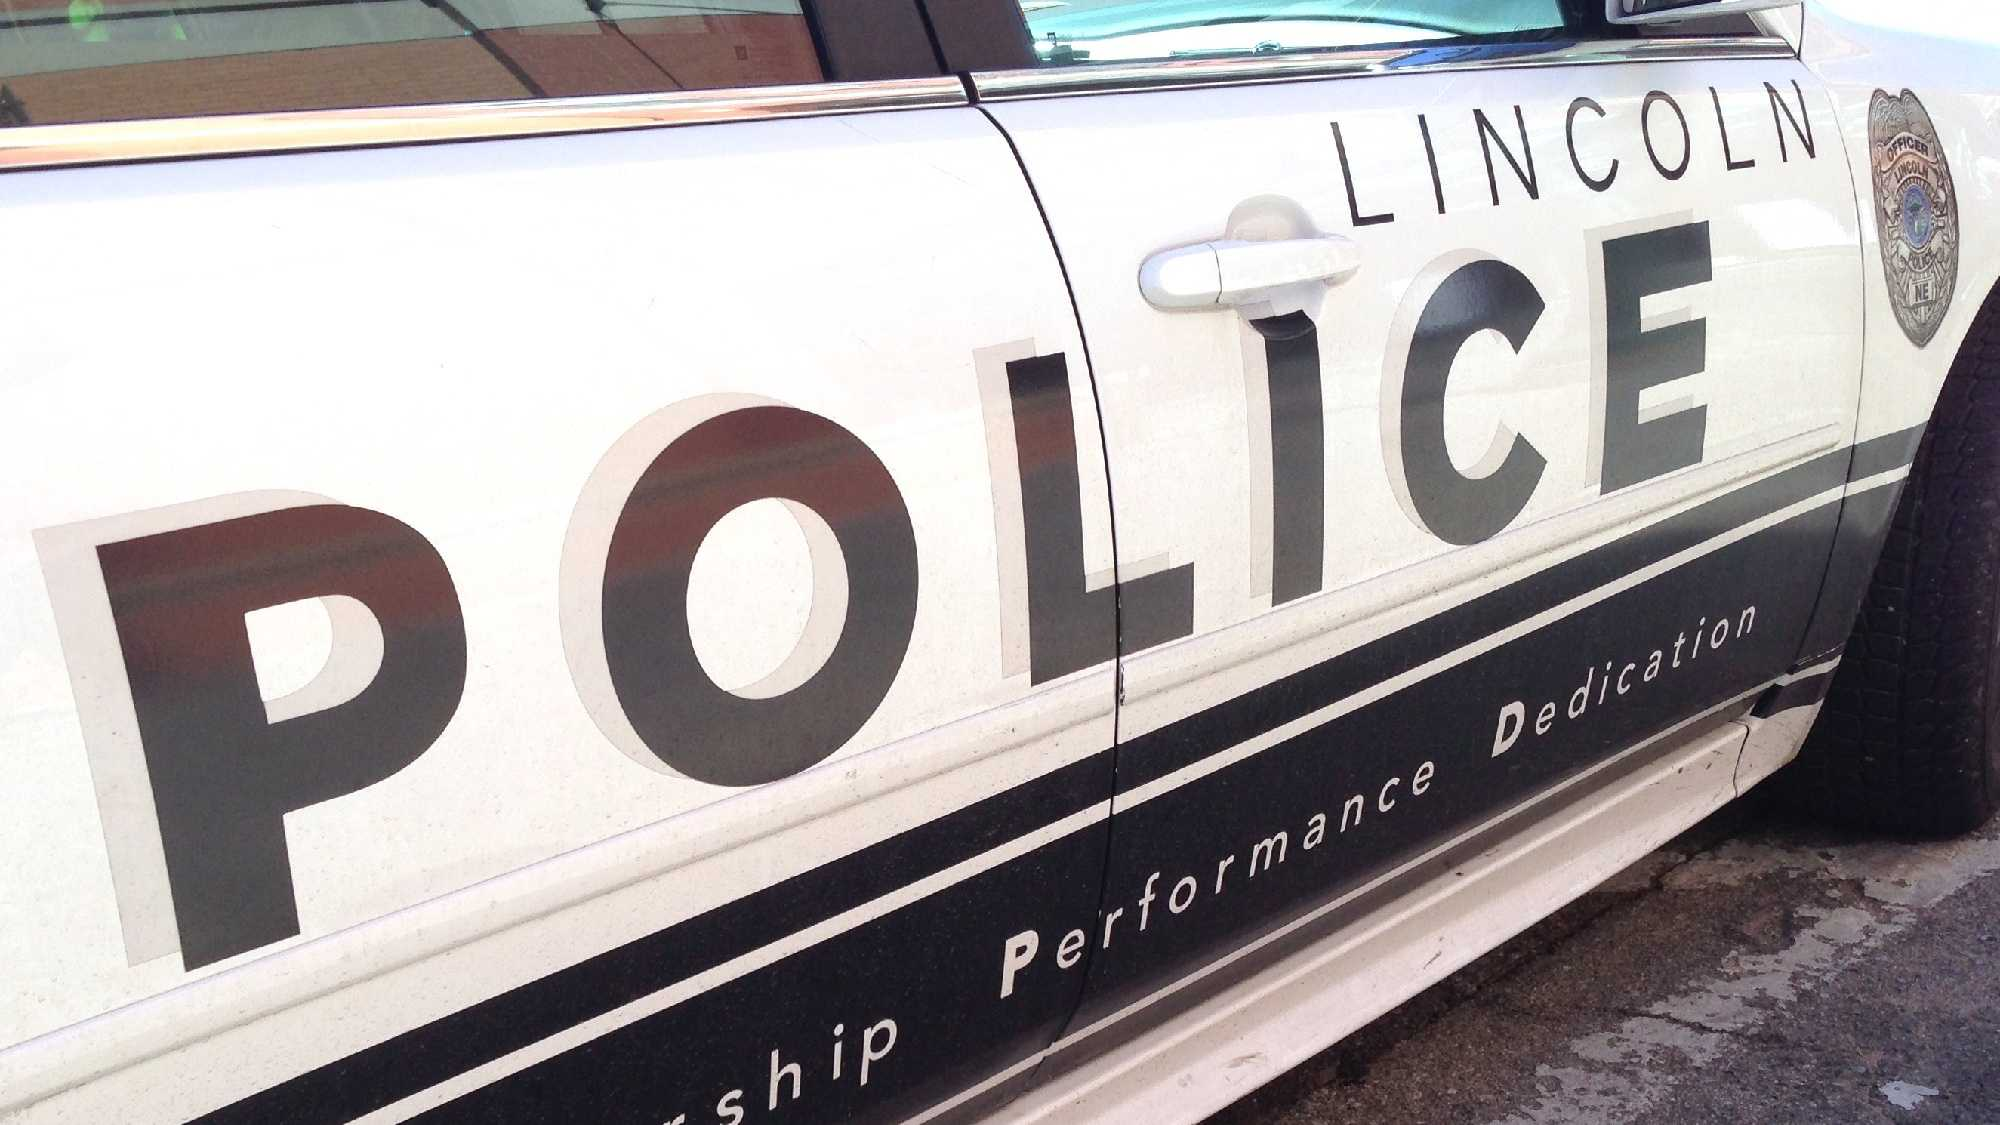 (day) Lincoln police generic.jpg